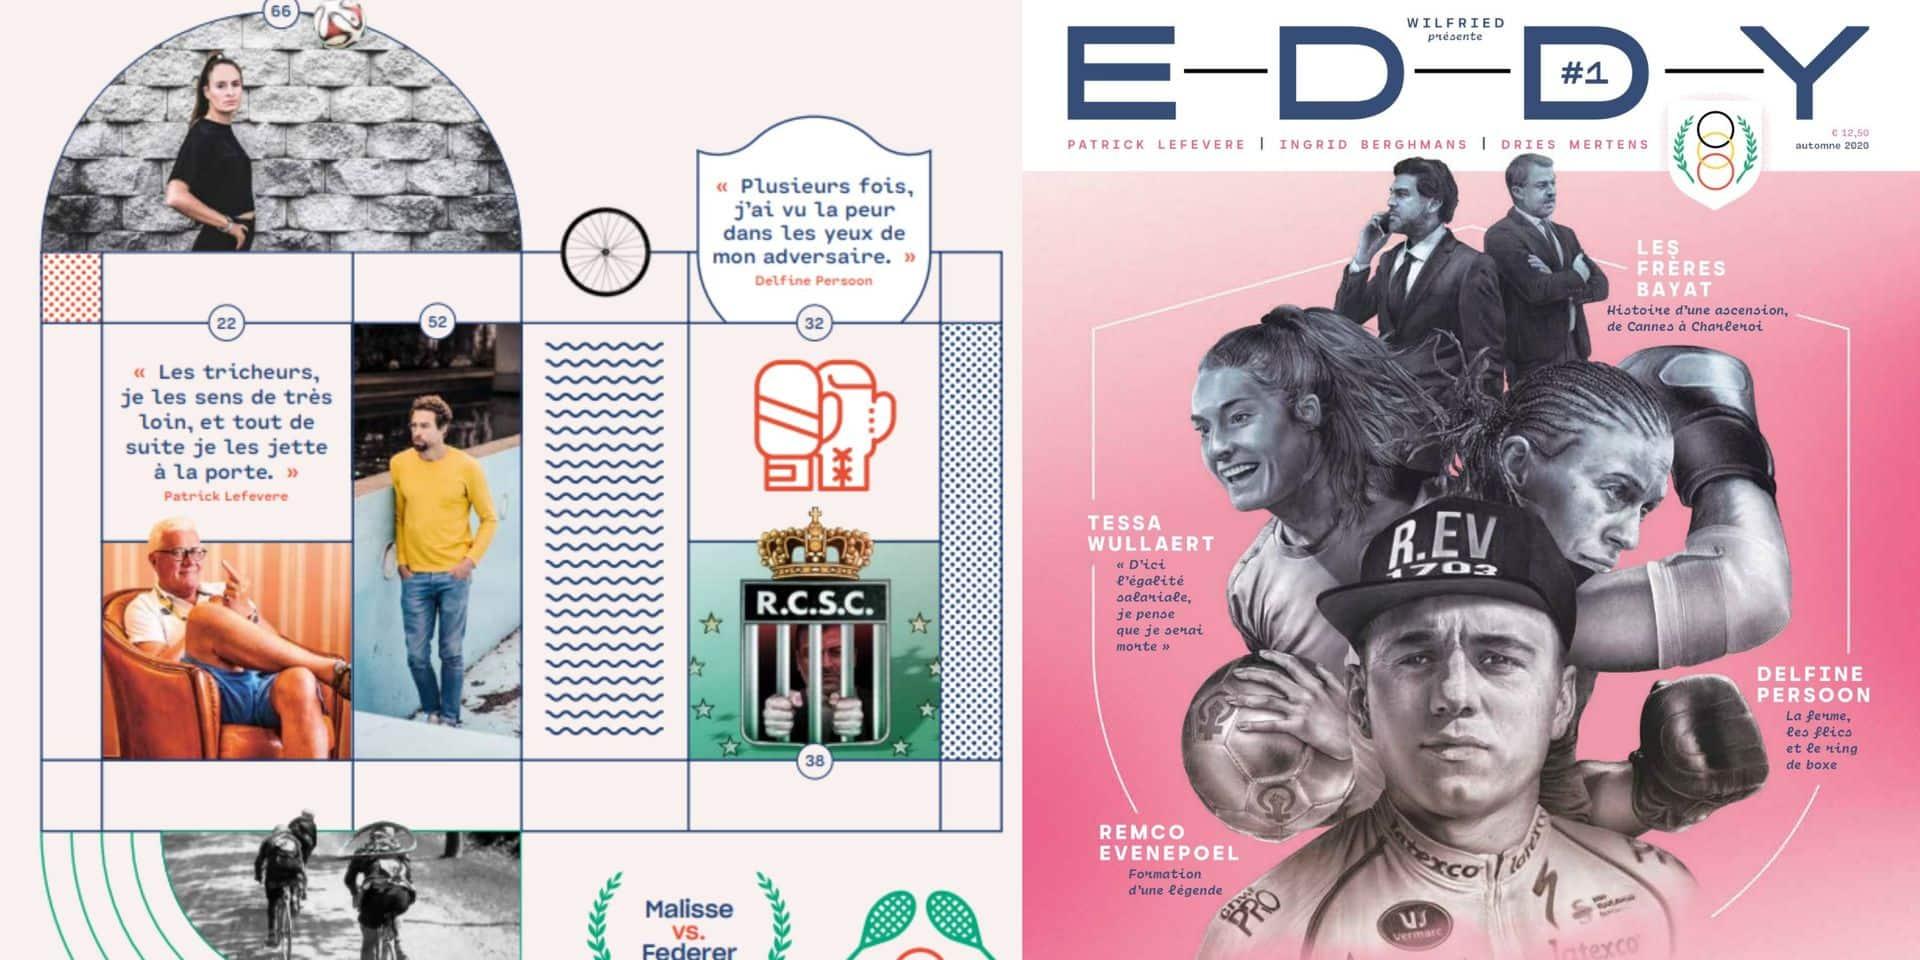 """Eddy"", magazine sportif belge innovant, prend la roue de ""Wilfried"" dès ce vendredi"